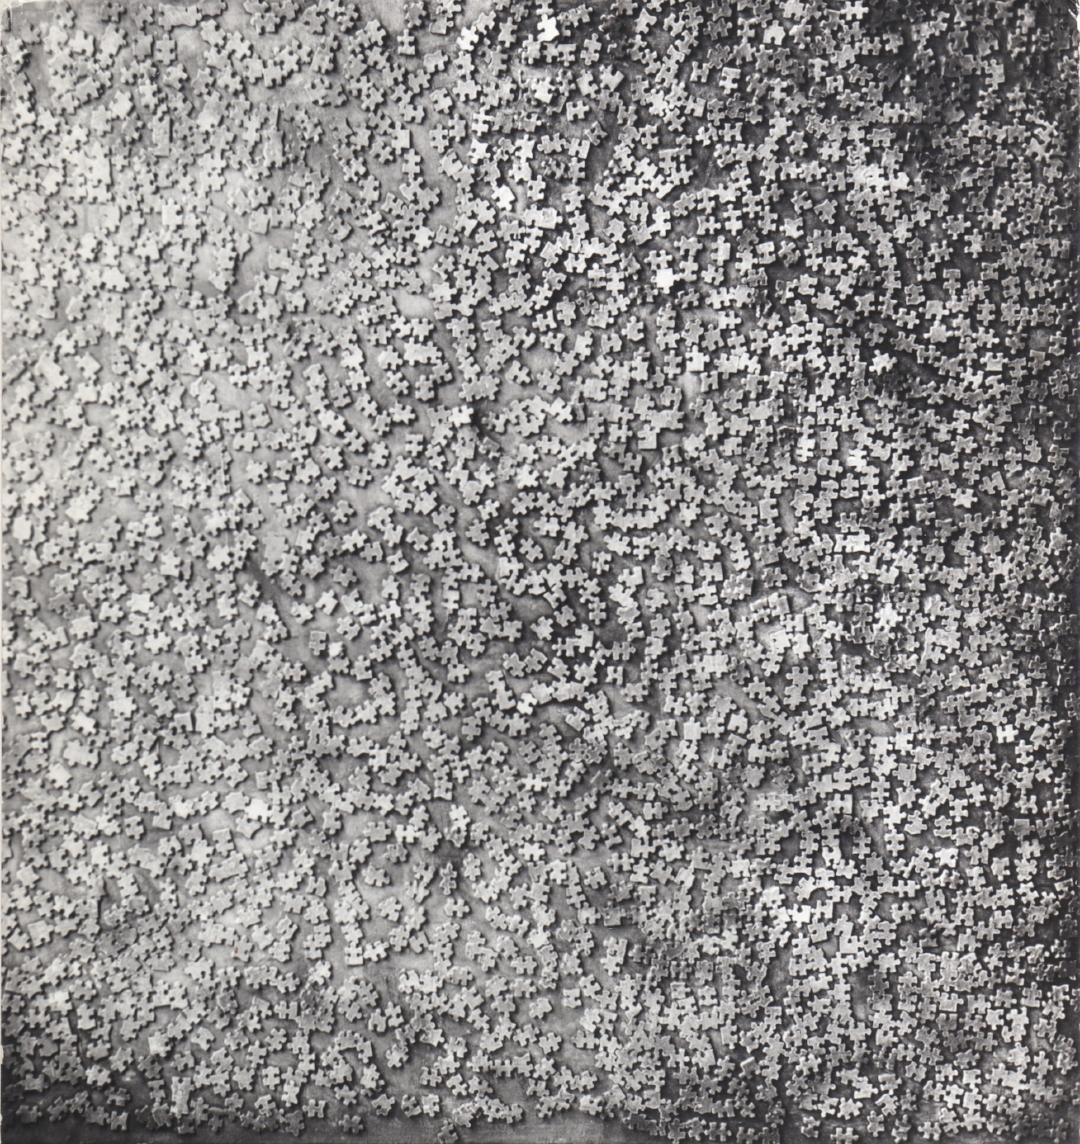 JIGGLE 1965